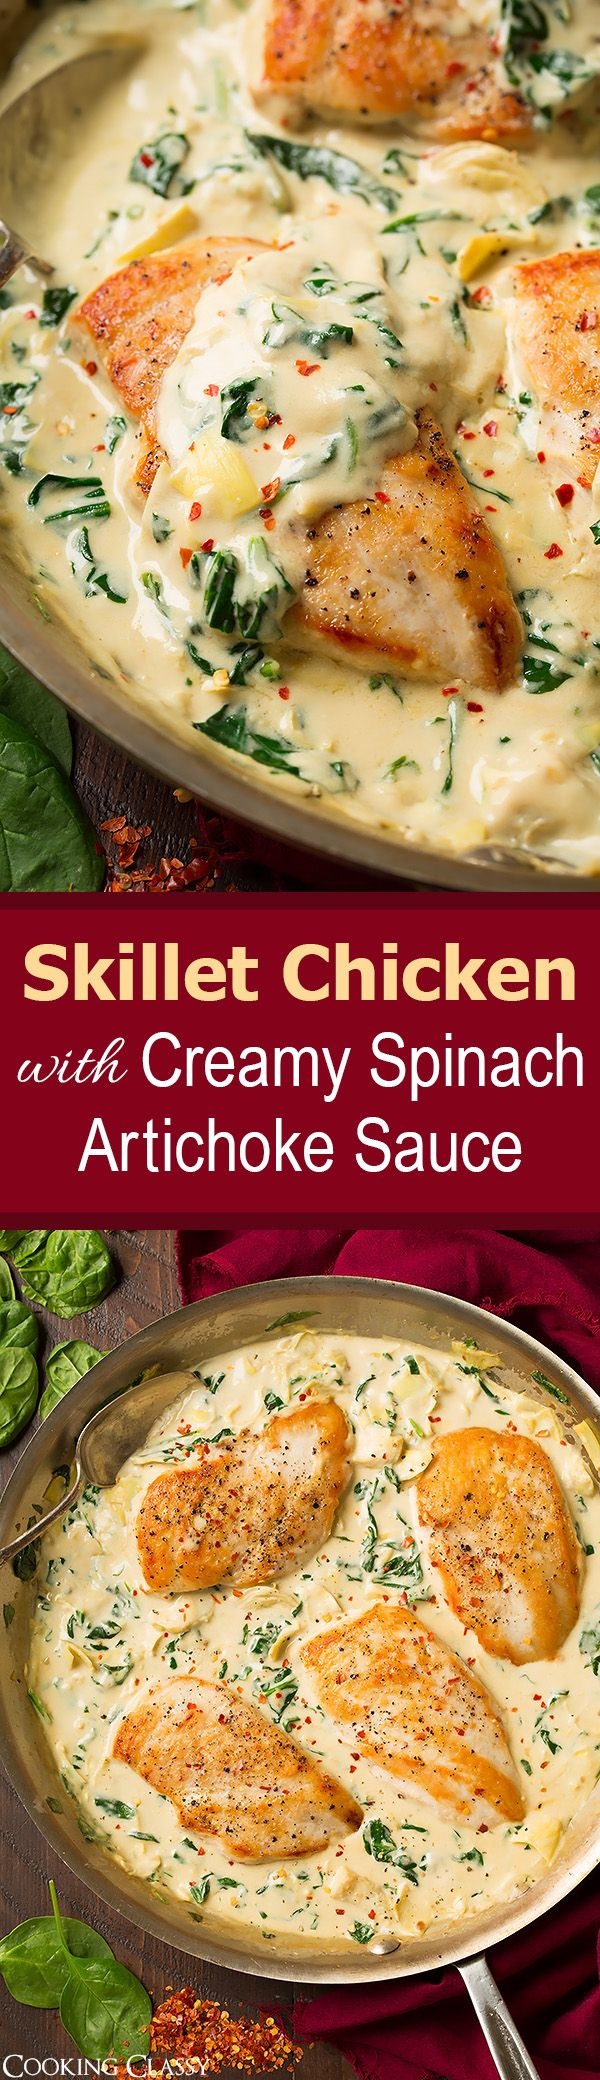 Skillet Chicken with Creamy Spinach Artichoke Sauce - this chicken is SO GOOD…